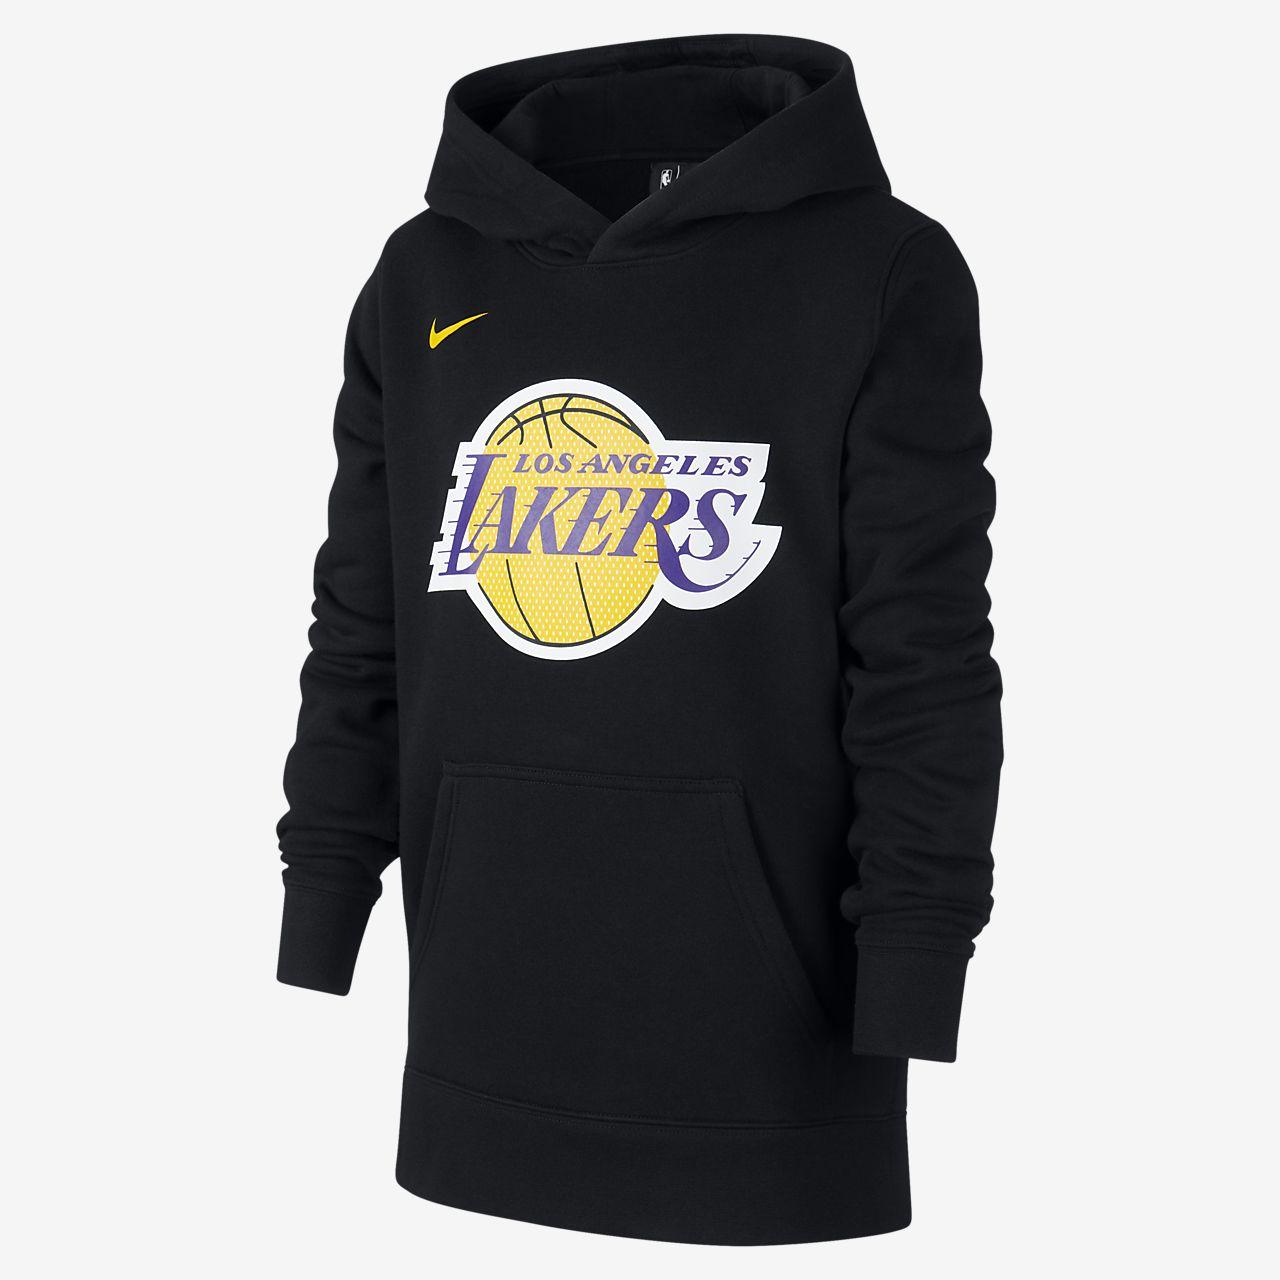 Los Angeles Lakers Jumpman Felpa Da Basket Nike scarpa da